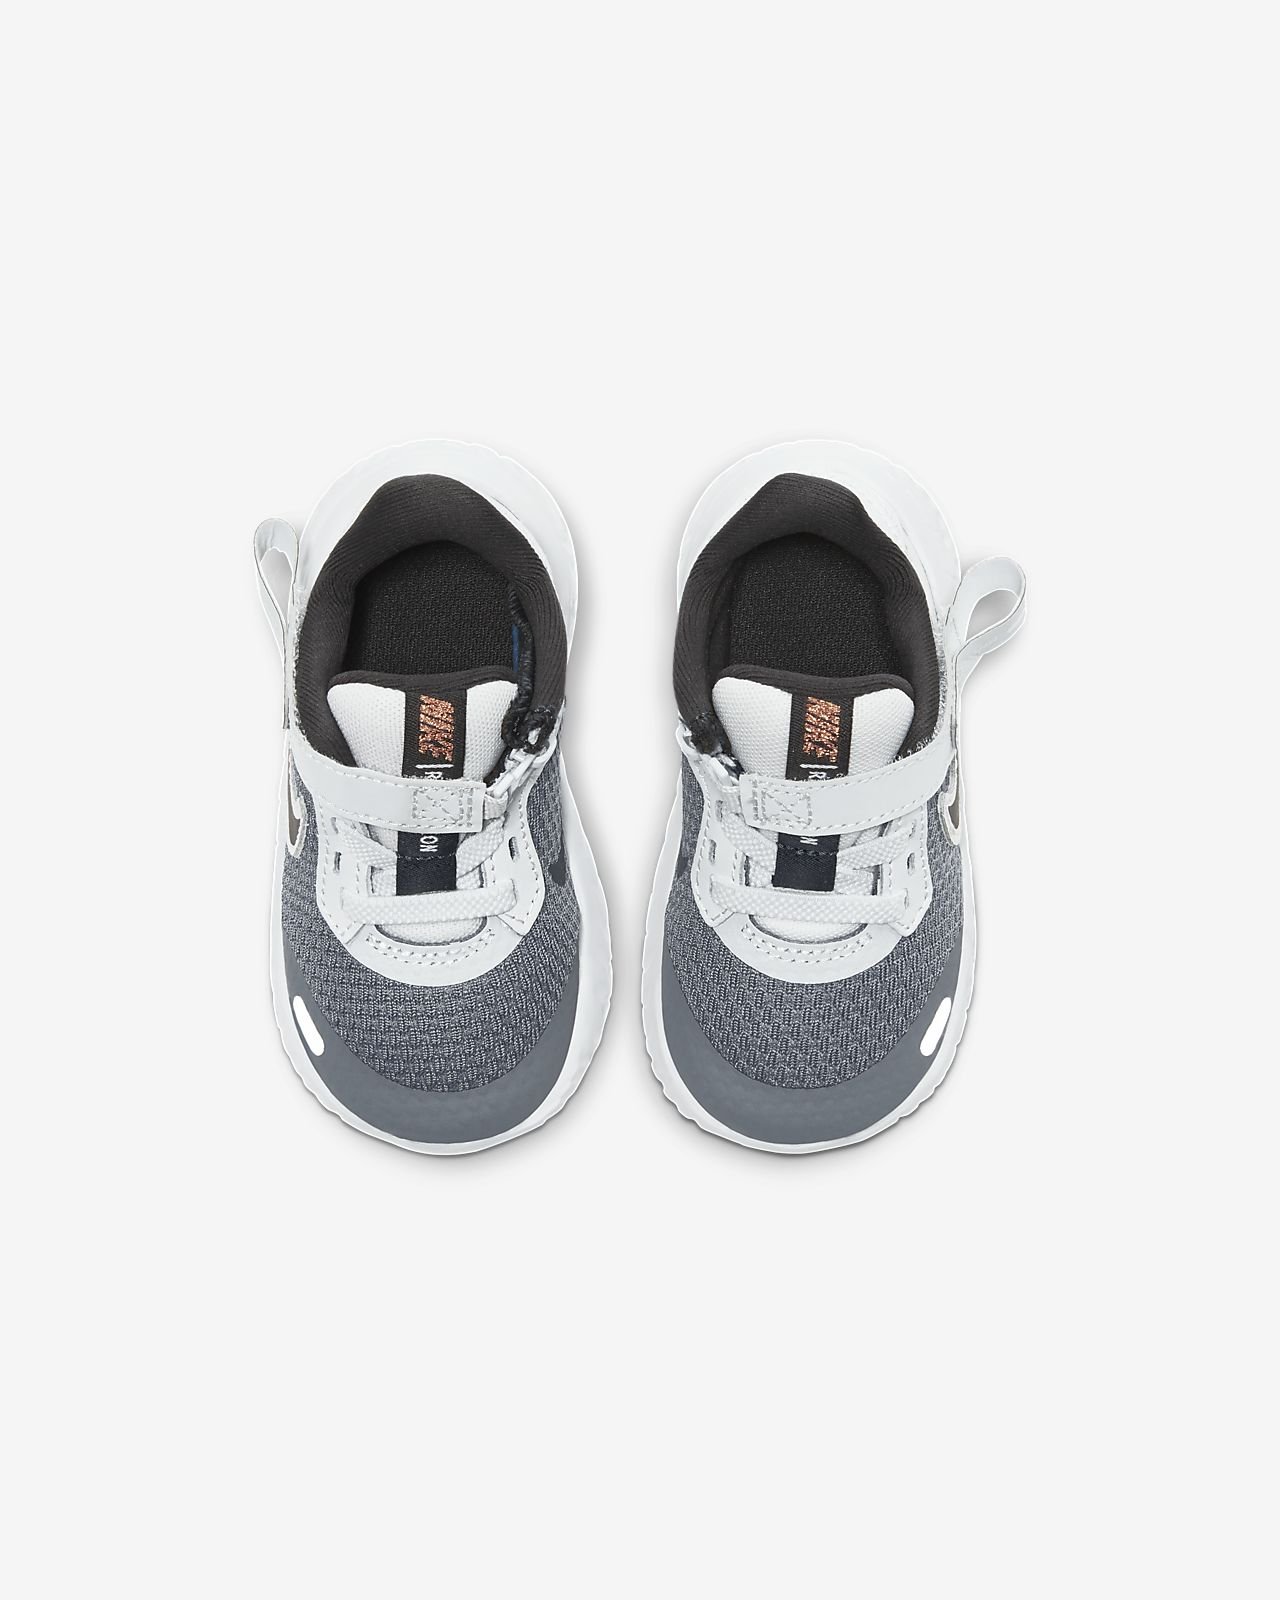 Sko Nike Revolution 5 FlyEase f?r babysm? barn